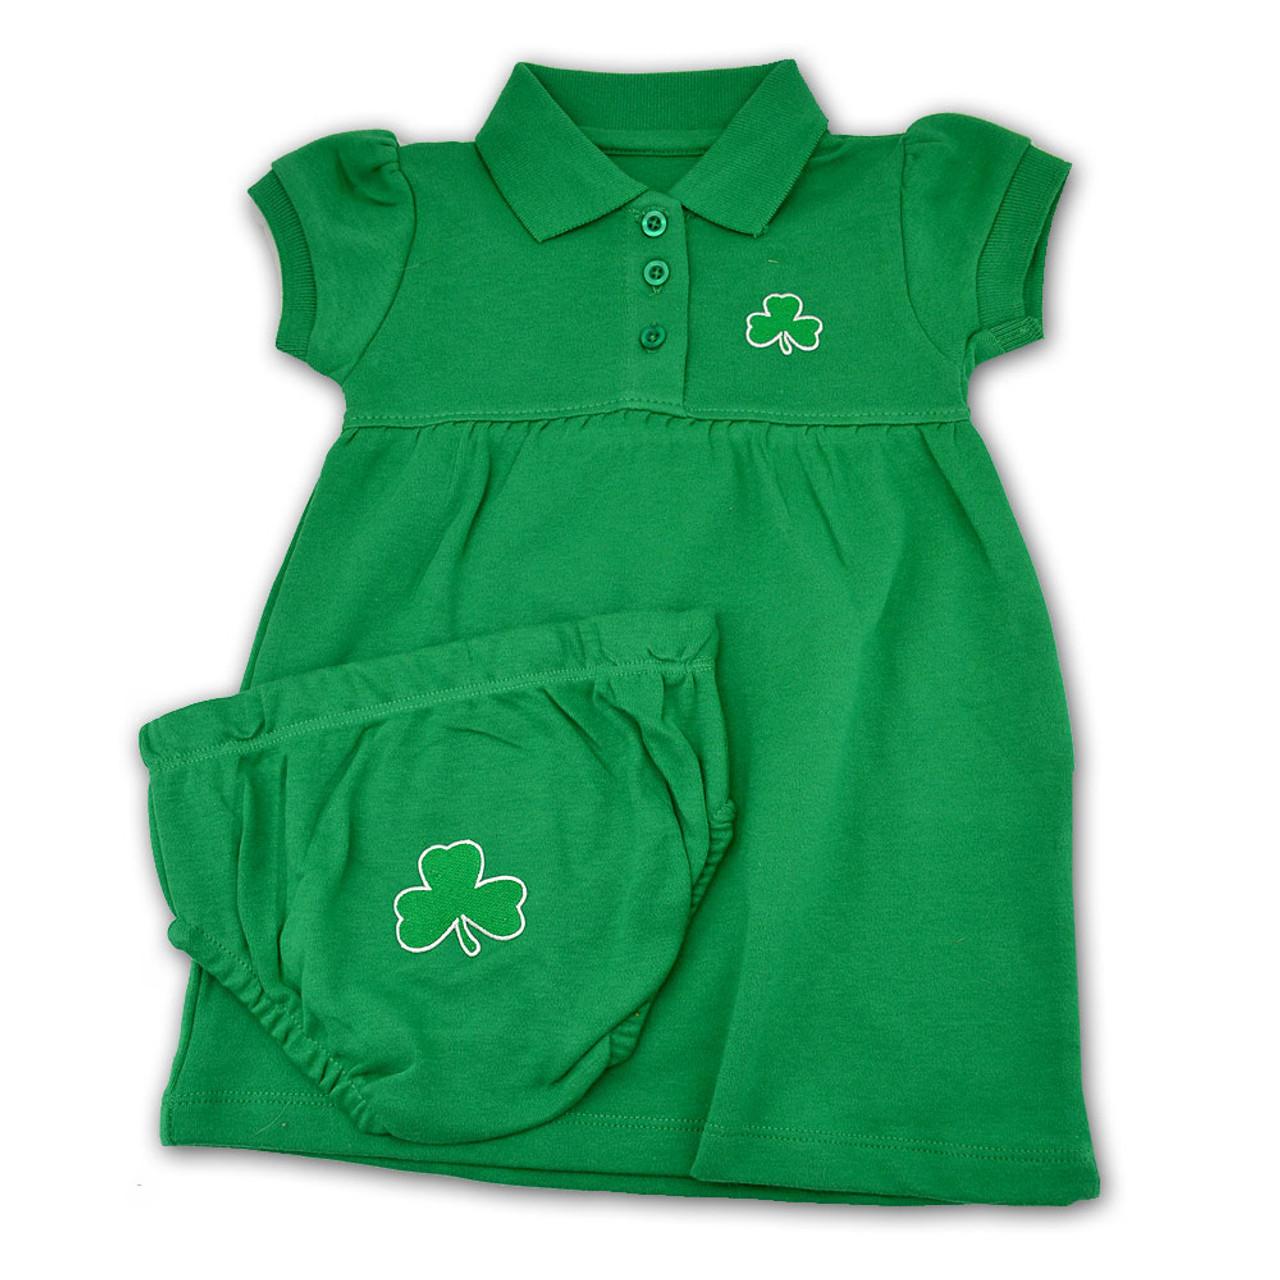 Green Baby Dress with Shamrock Design